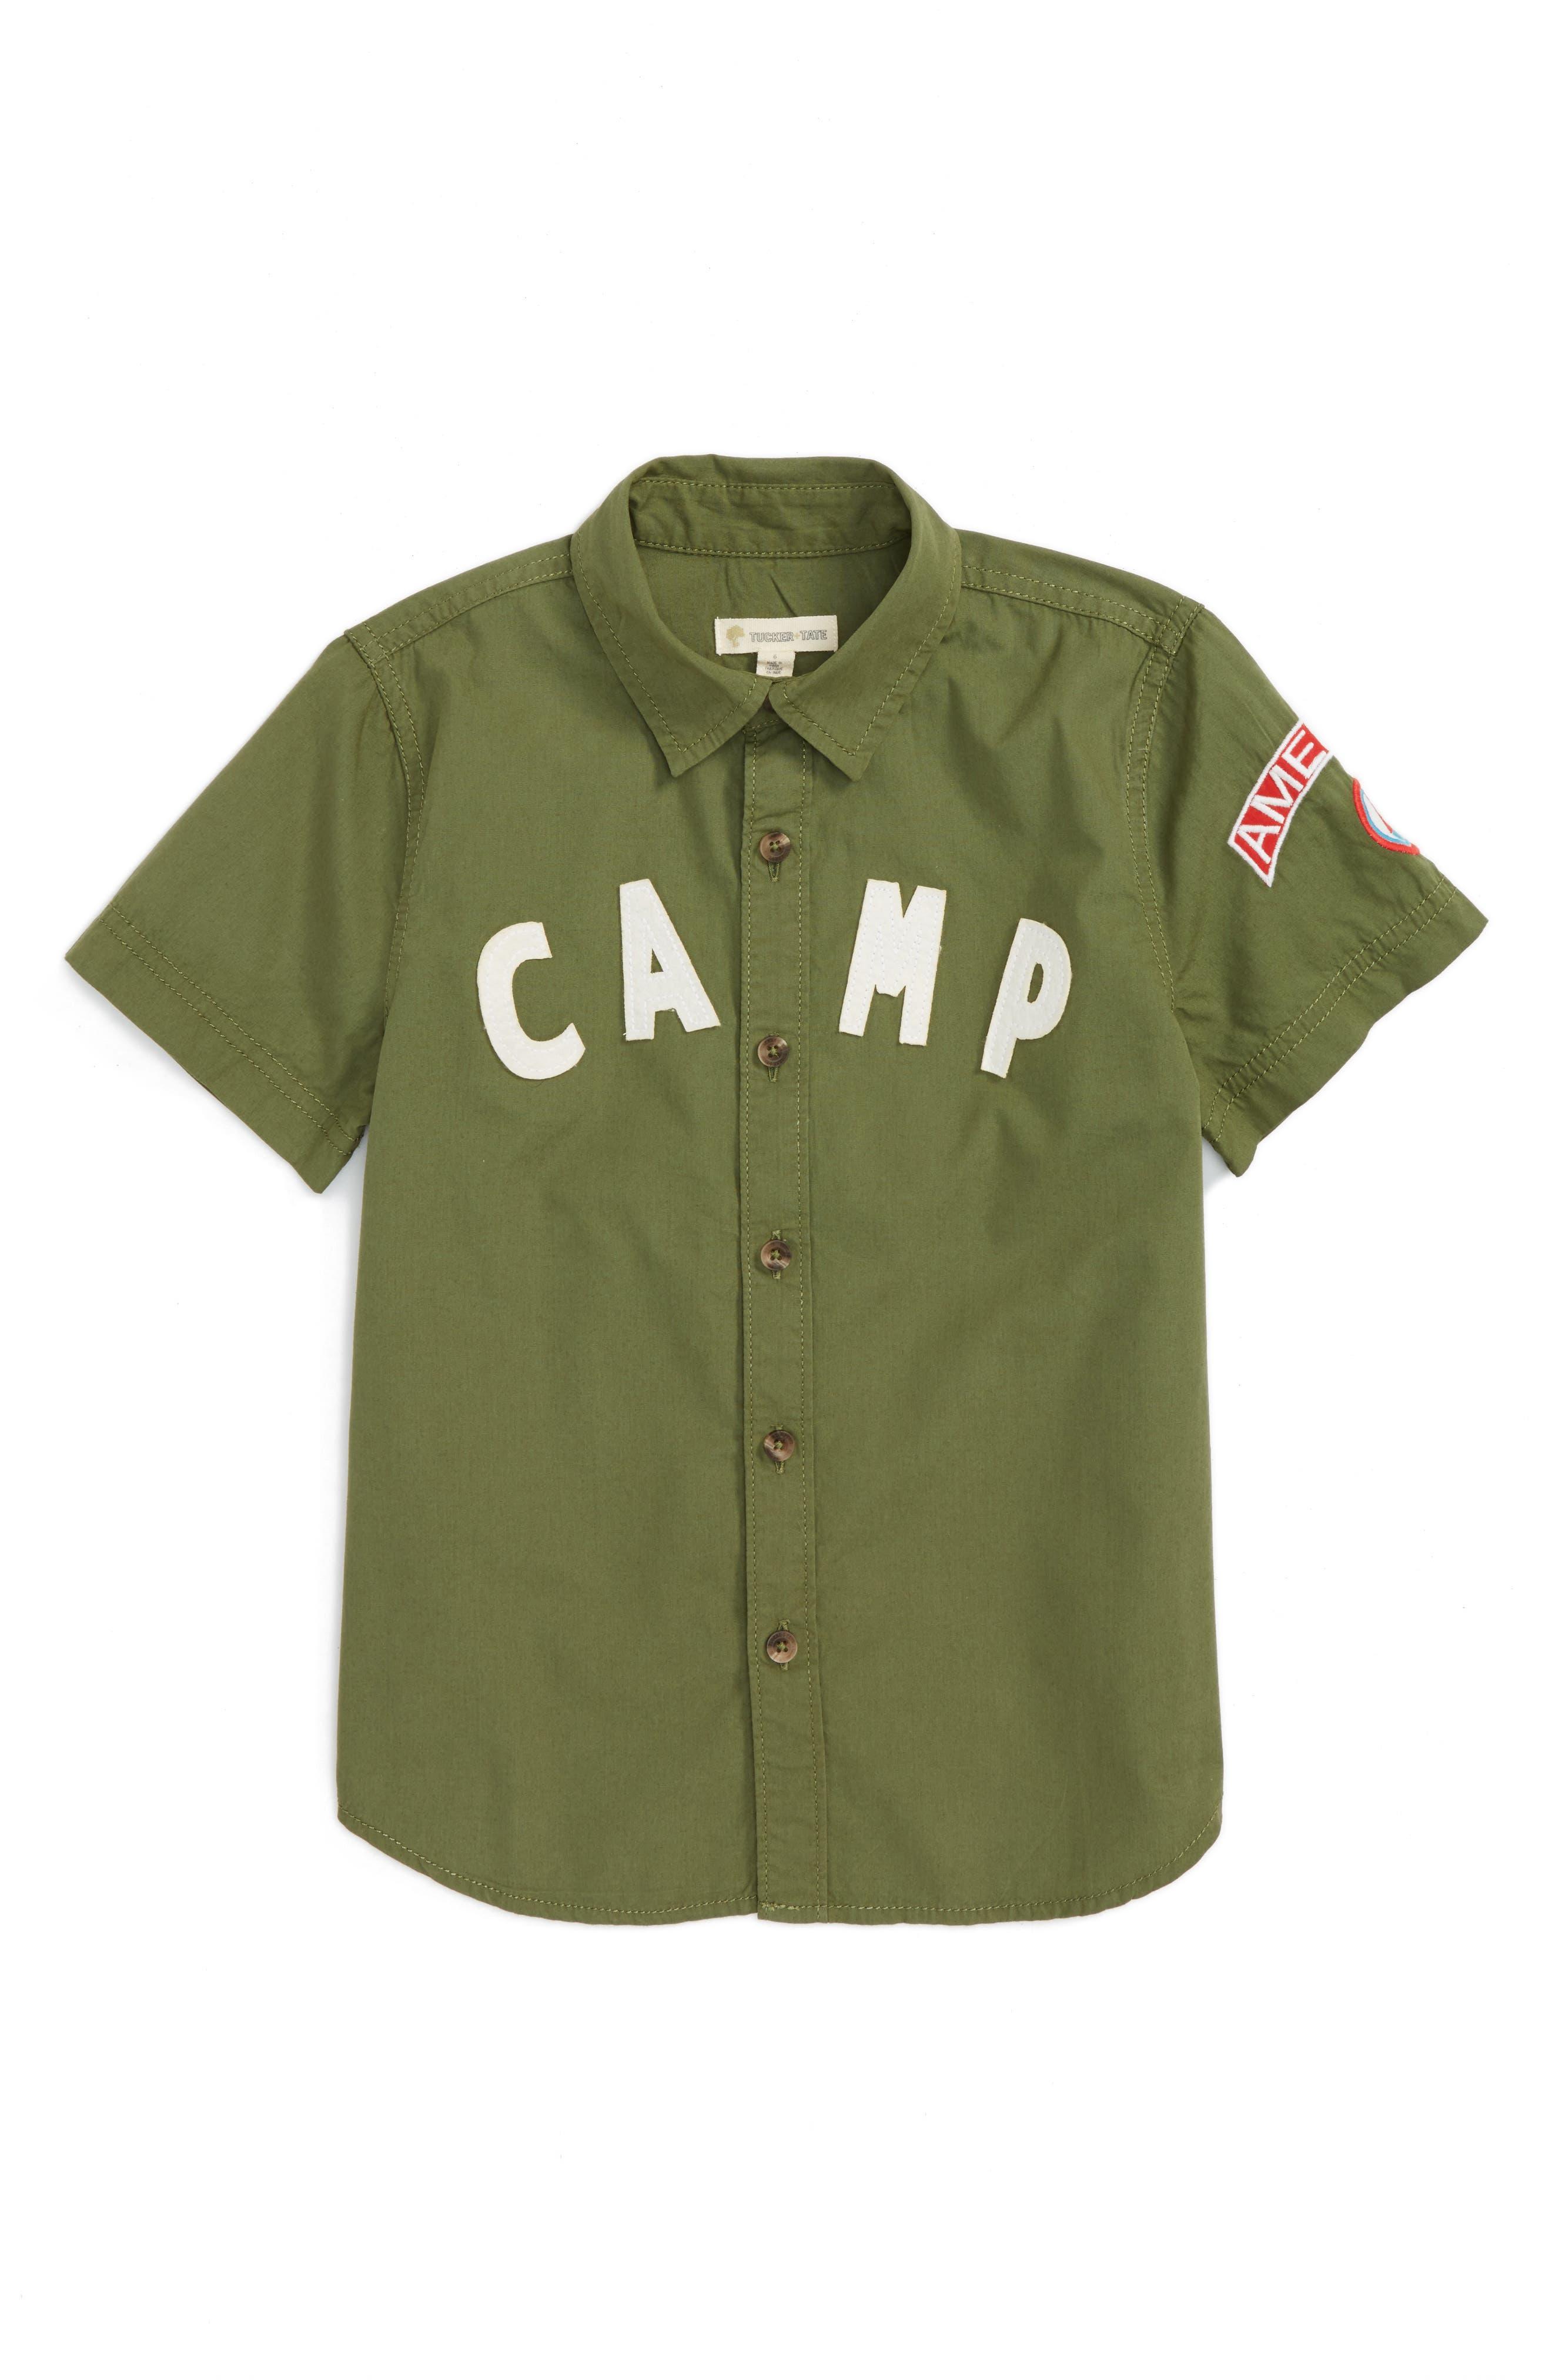 Camp Shirt,                         Main,                         color, 311